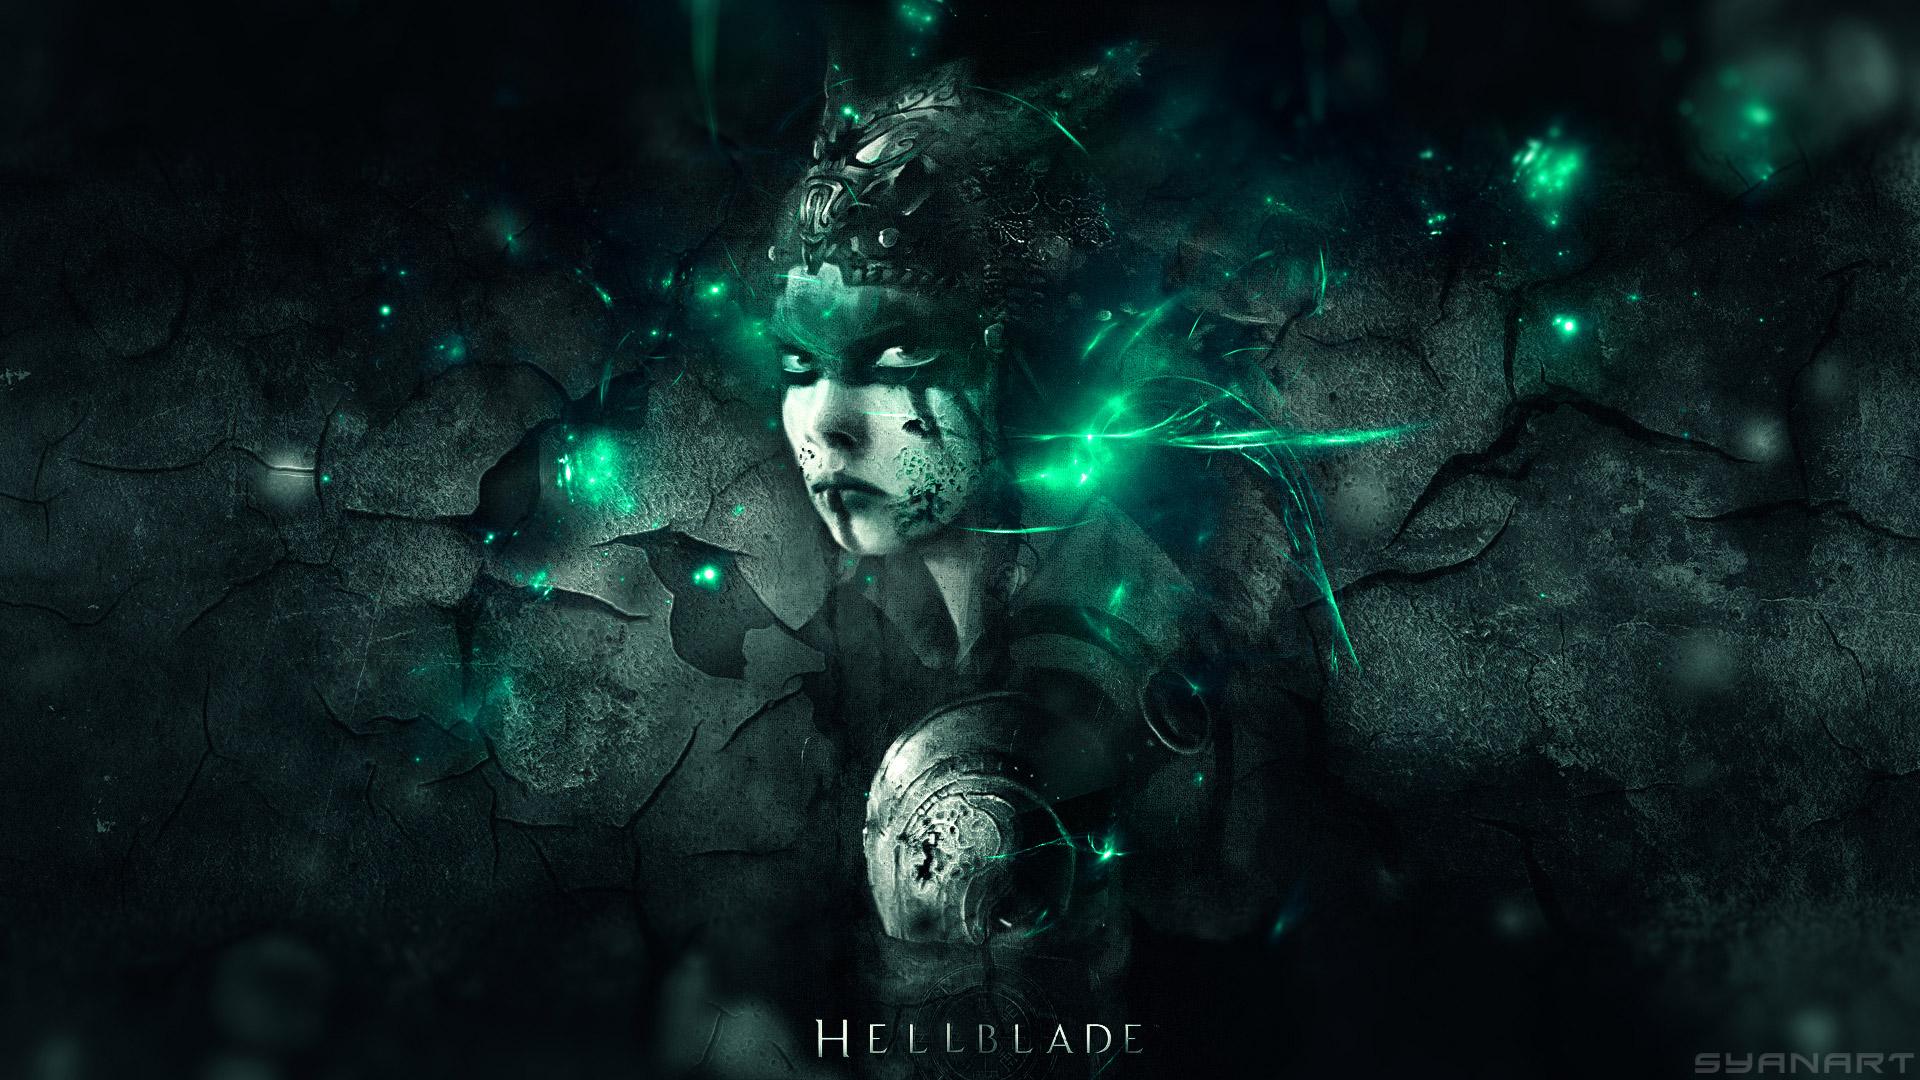 Free Hellblade: Senua's Sacrifice Wallpaper in 1920x1080